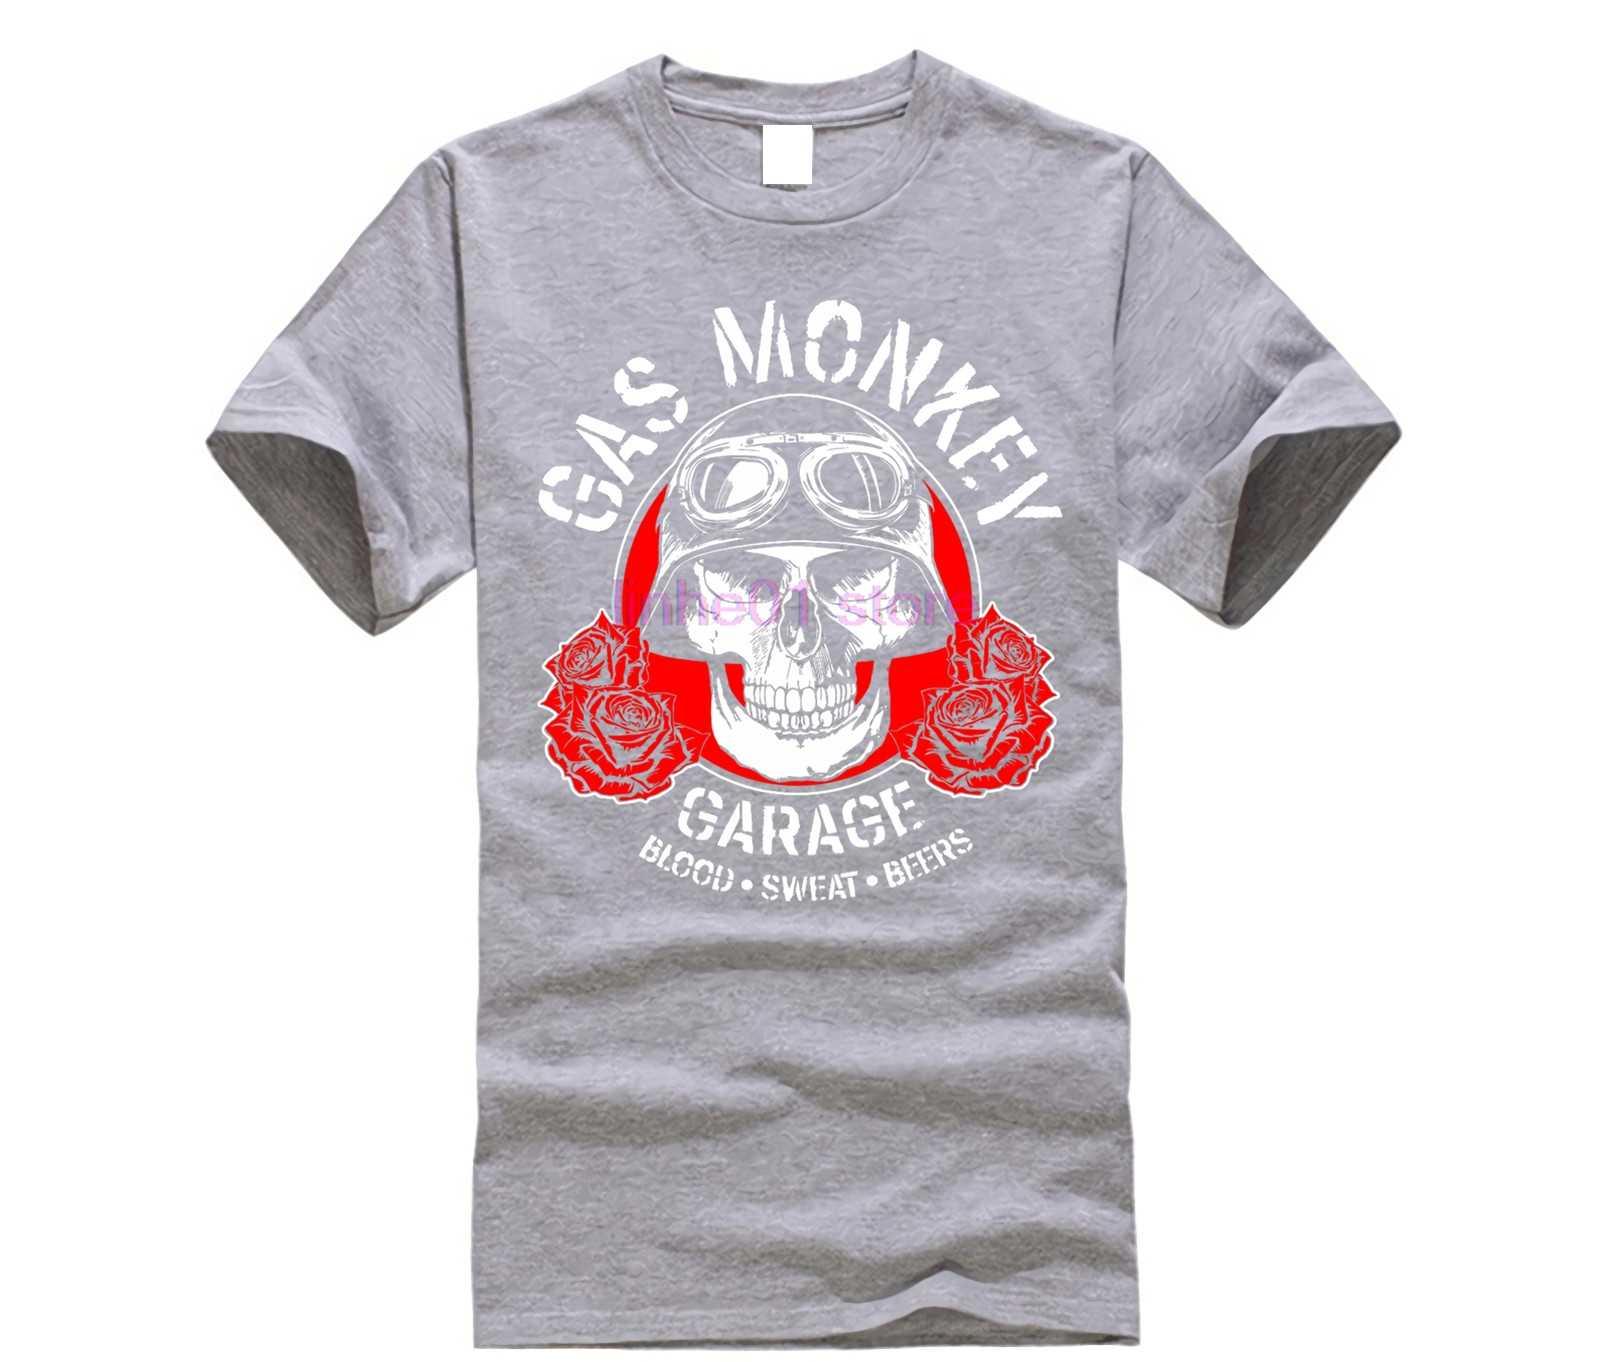 GILDAN 2019 NEW shirt GAS MEN shirt MONKEY Garage Skull Custom Builds  Licensed Fast N Loud Black Mens T-shirt